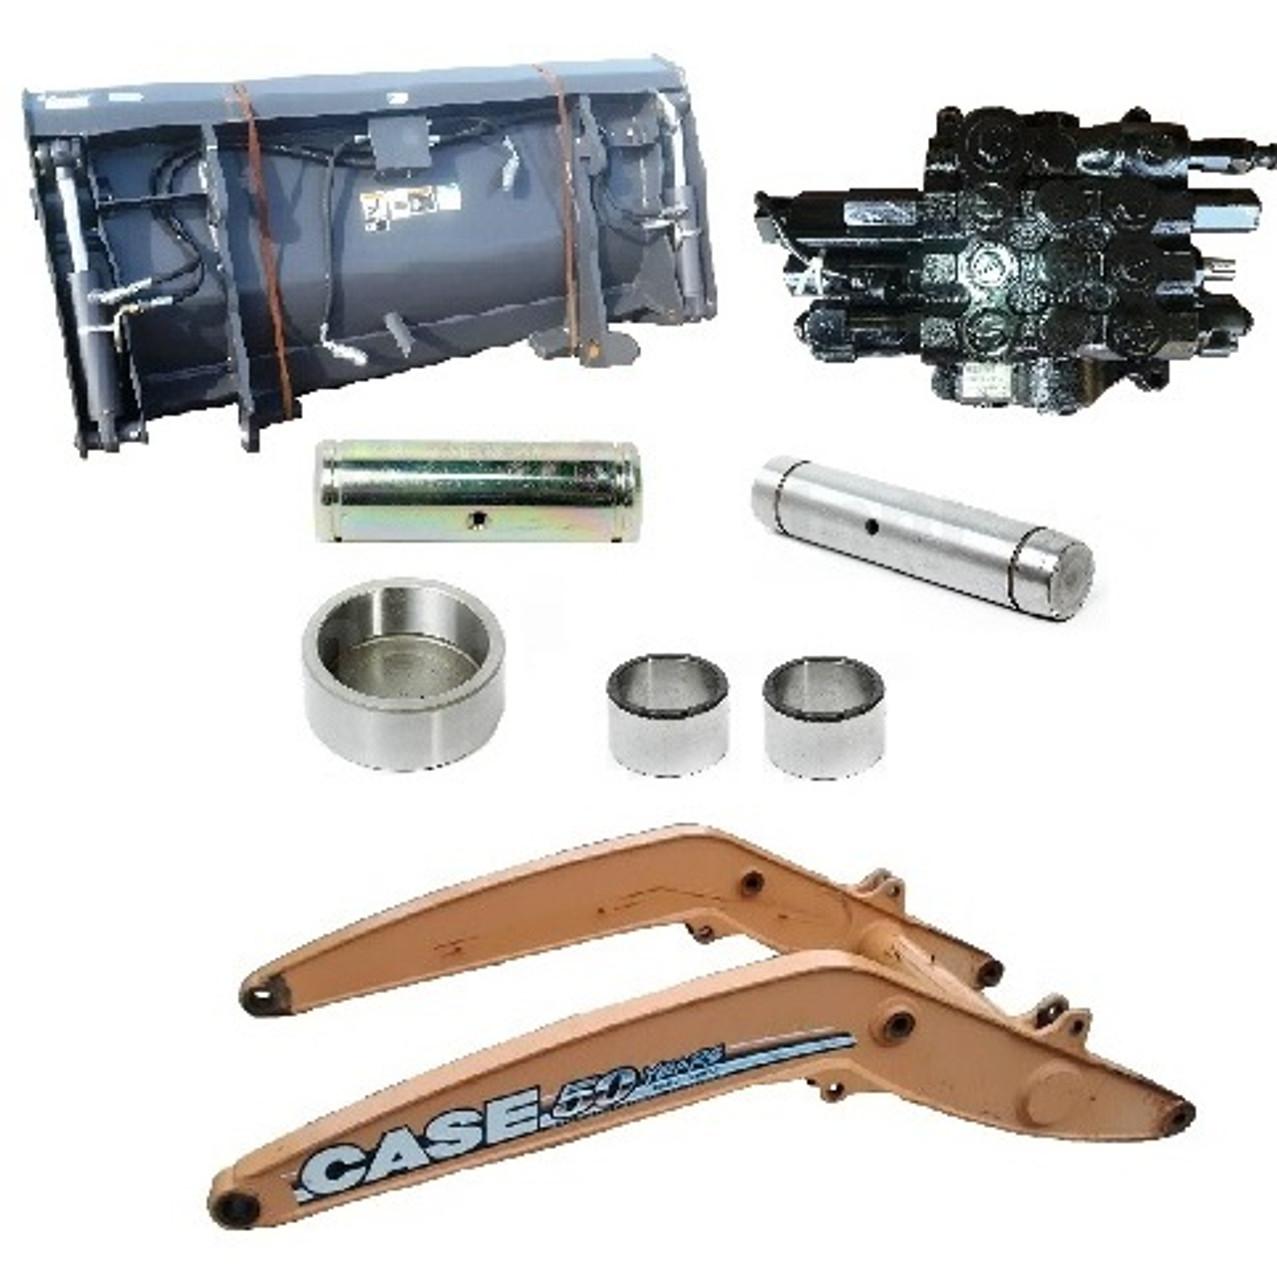 Case Backhoe Parts | Used Case Backhoe Parts | BrokenTractor com